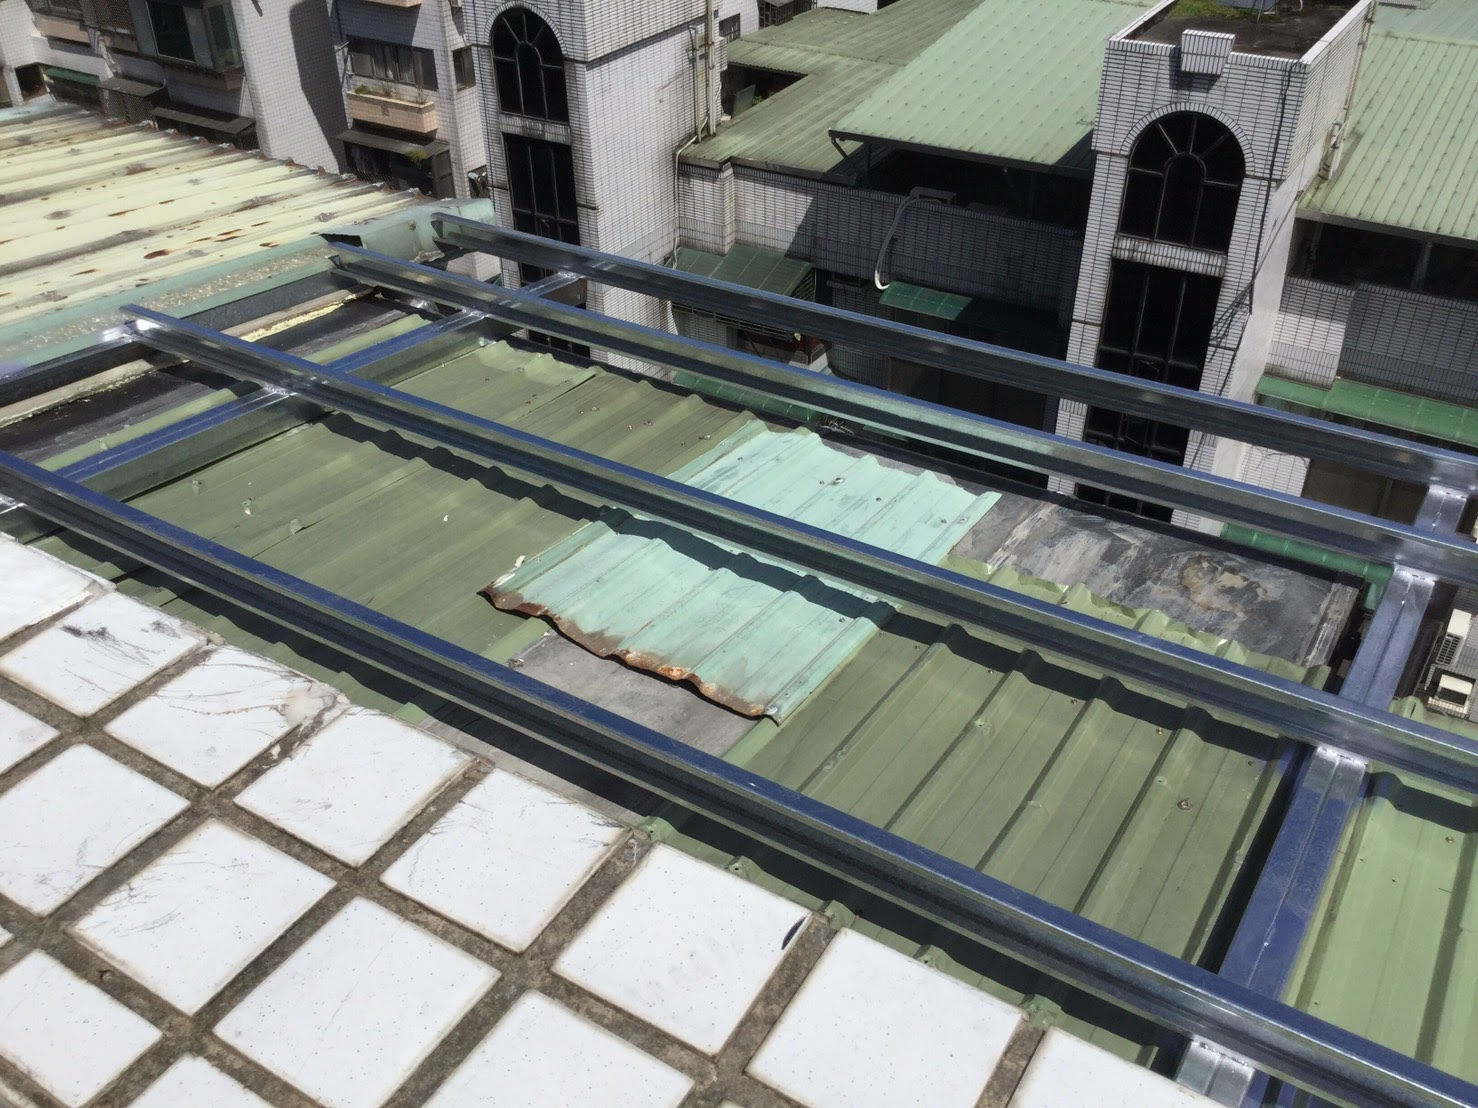 C鋼一側和隔壁的屋頂焊在一起